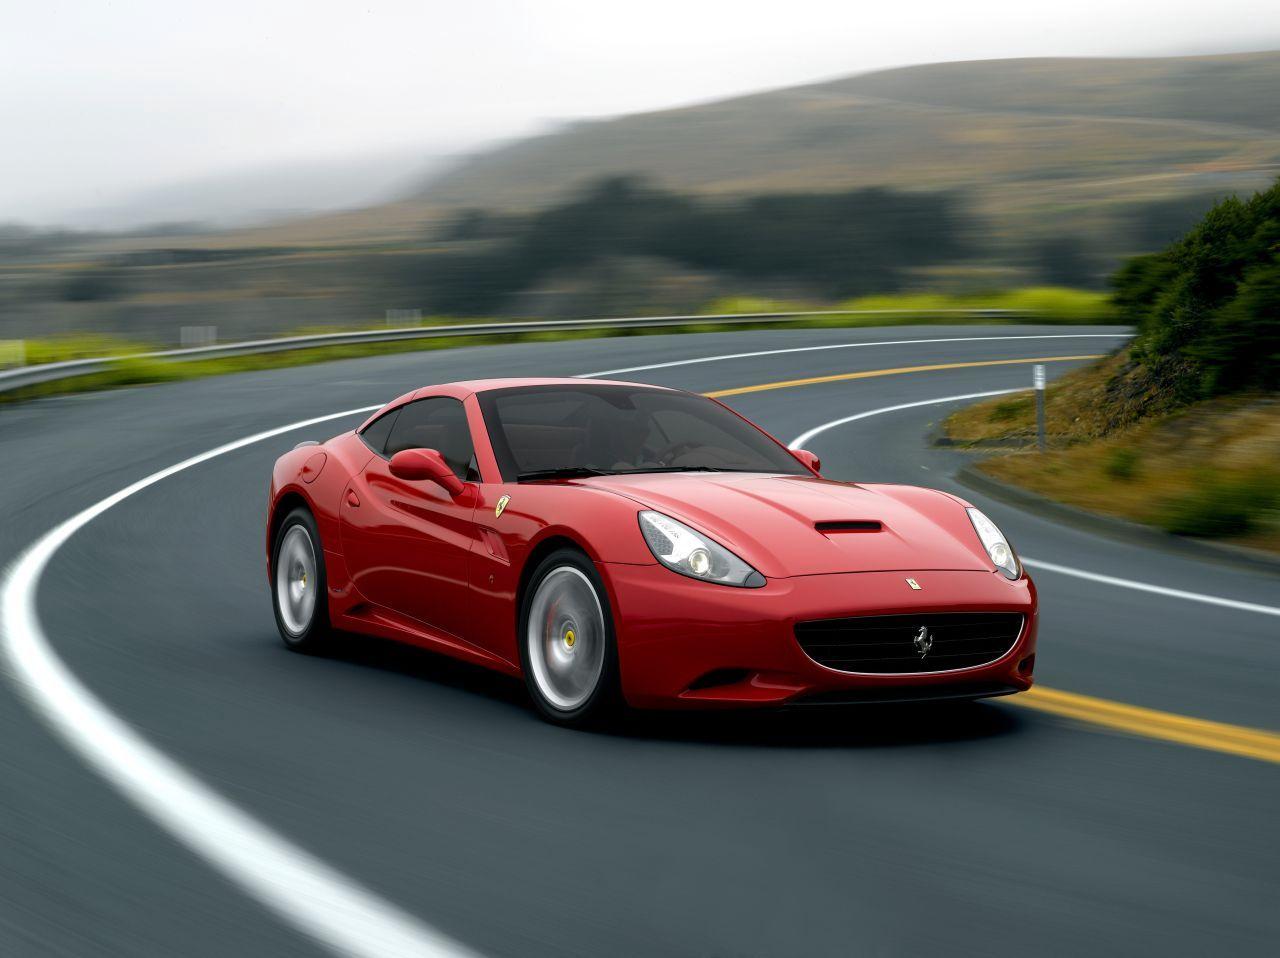 2009 Ferrari California Overview